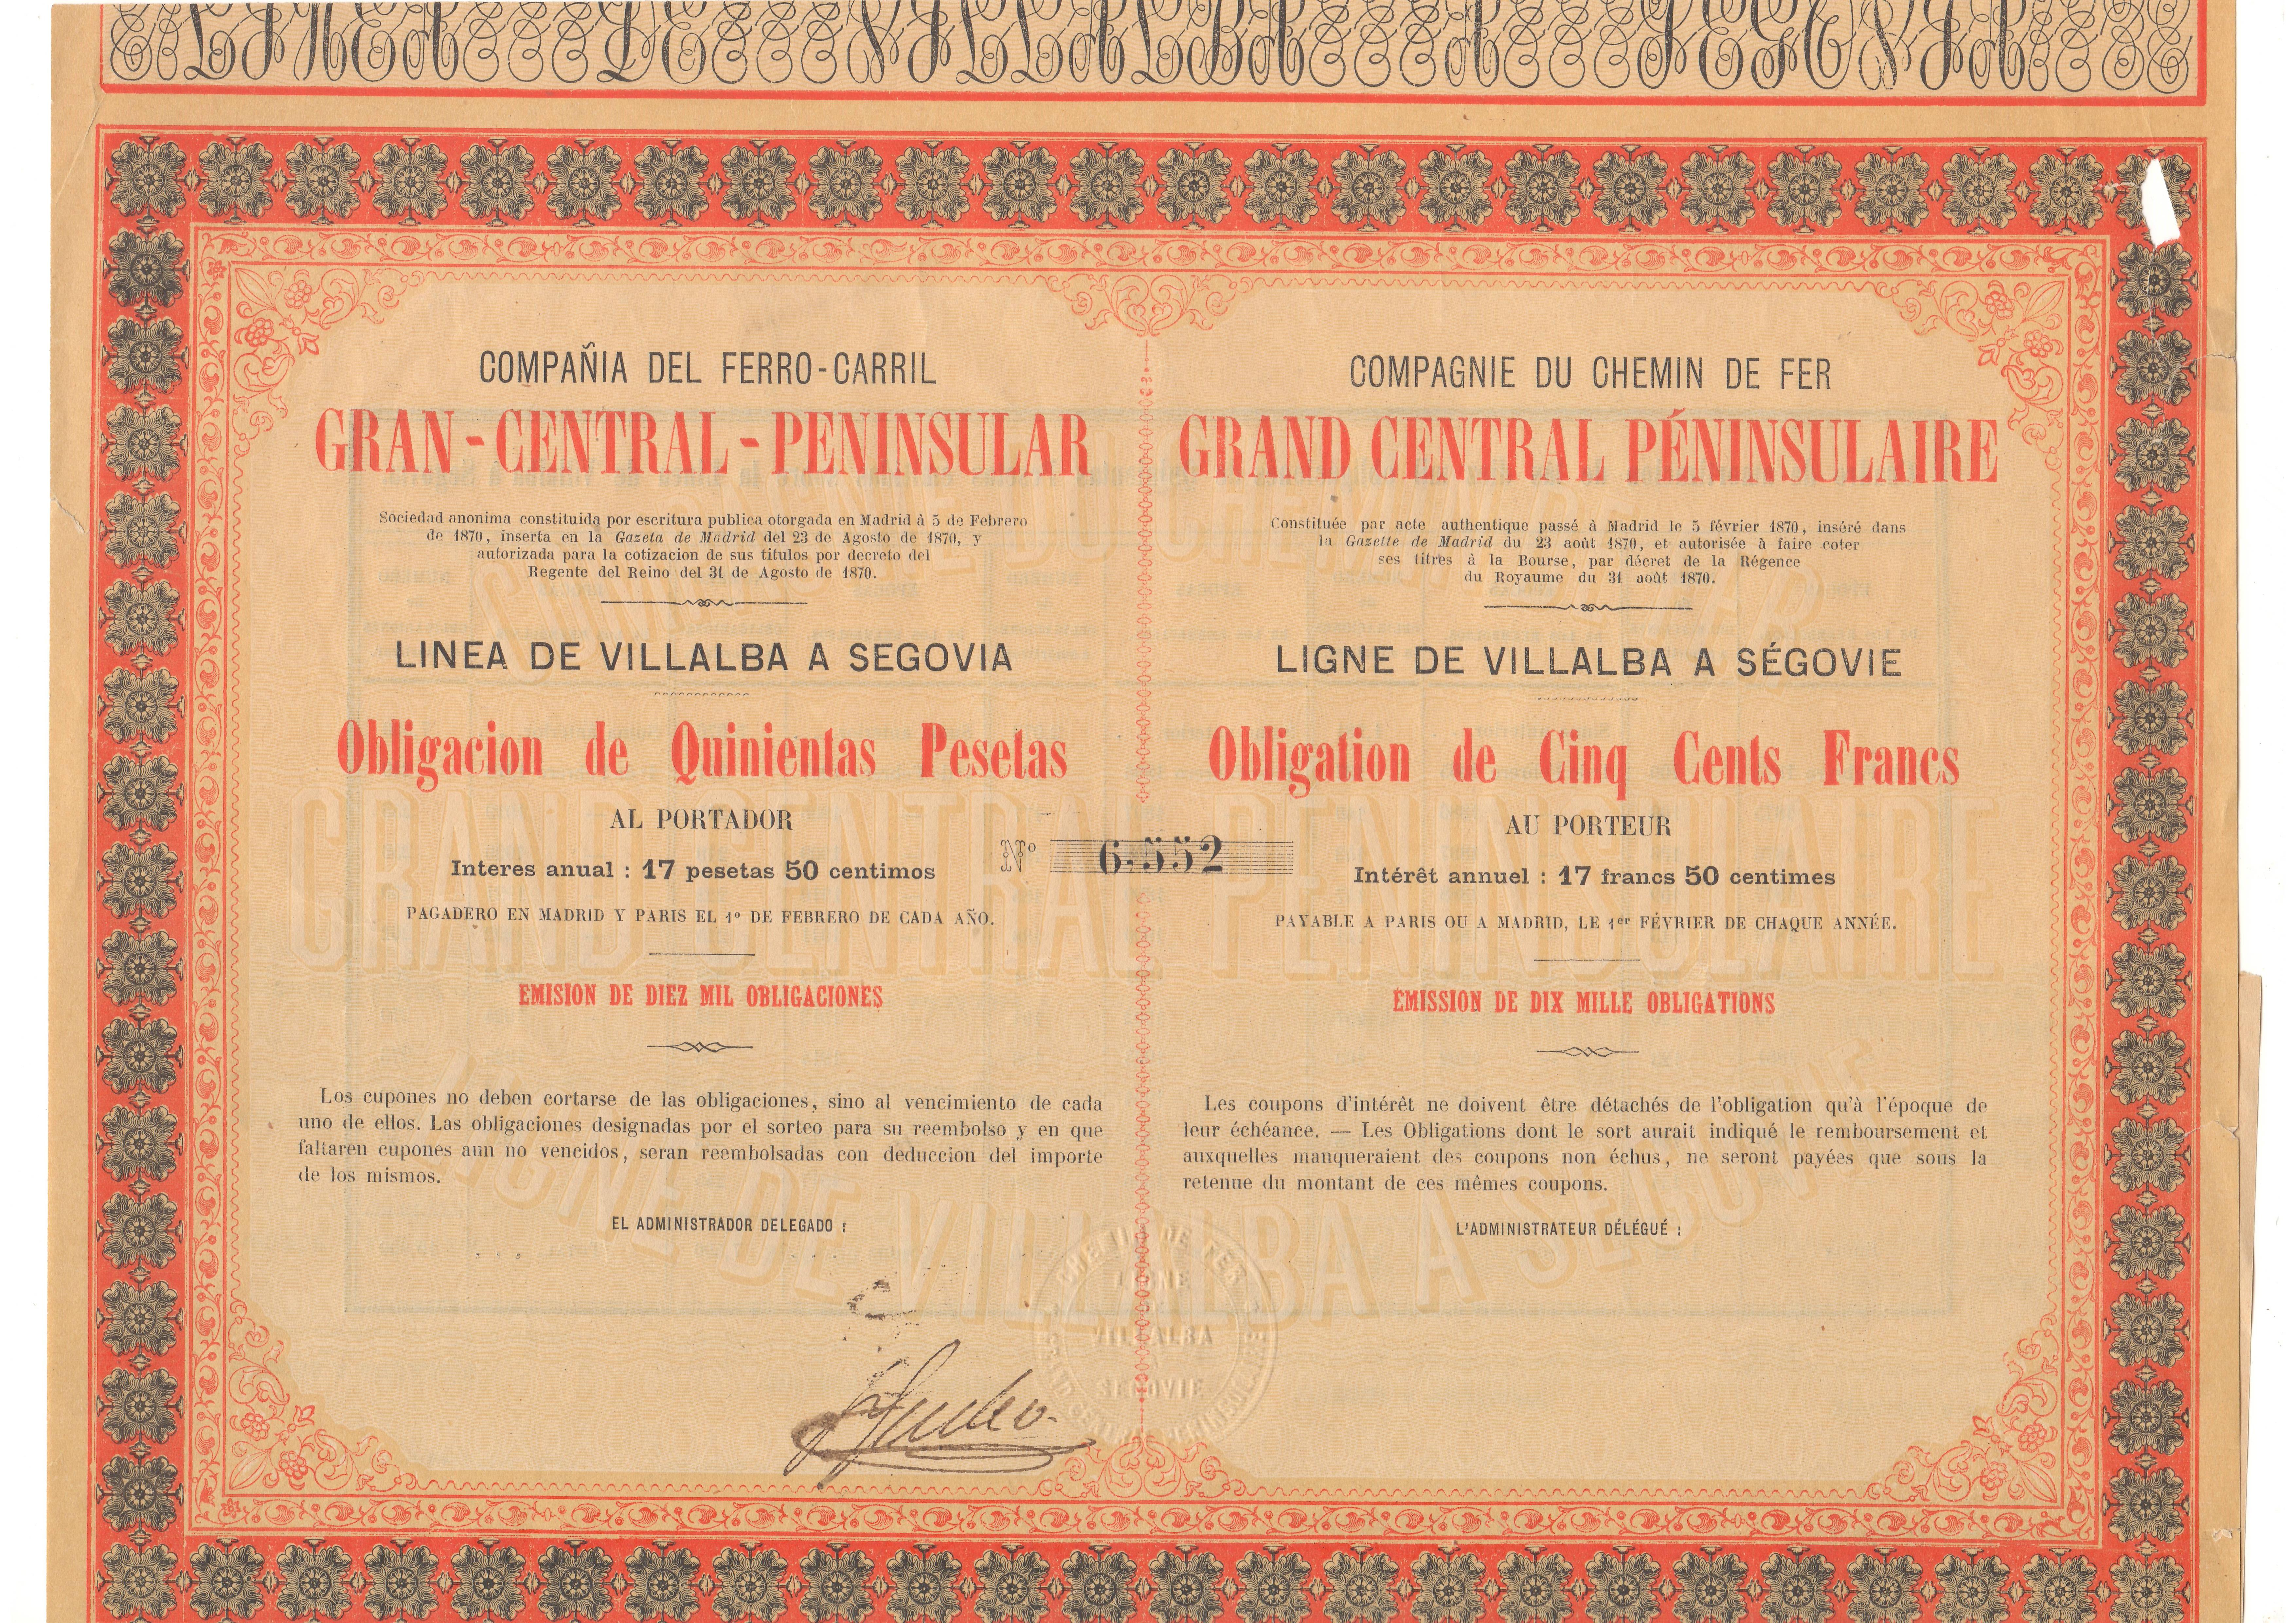 Compañía del Ferrocarril Gran Central Peninsular